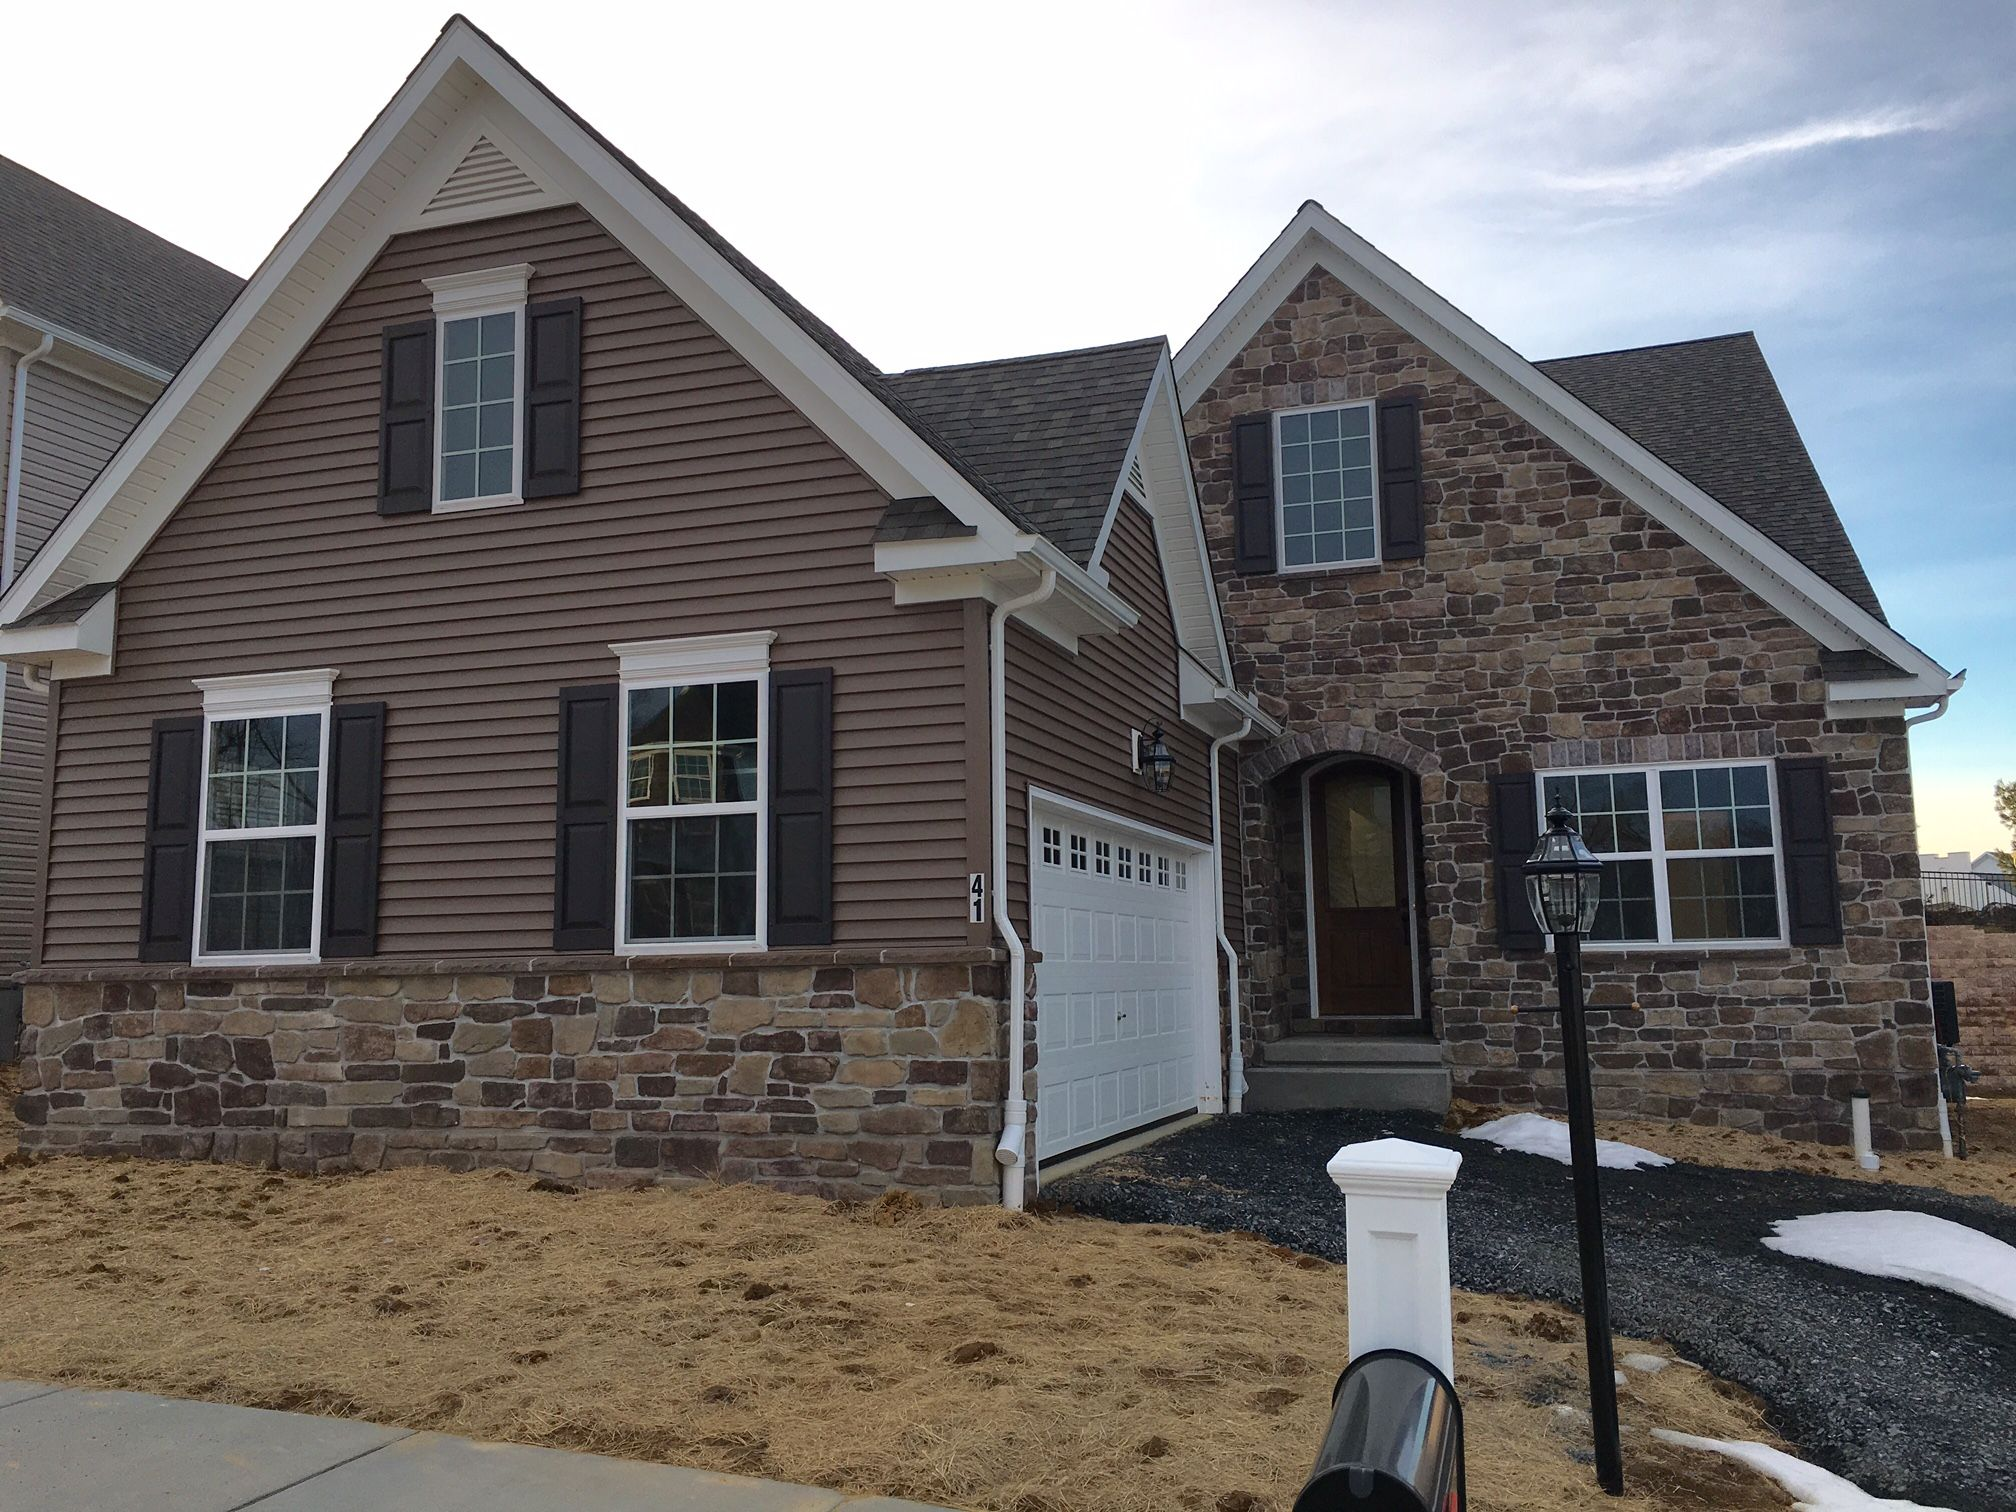 41 Alderwood Way Lancaster, PA, Lancaster, PA Homes & Land - Real Estate